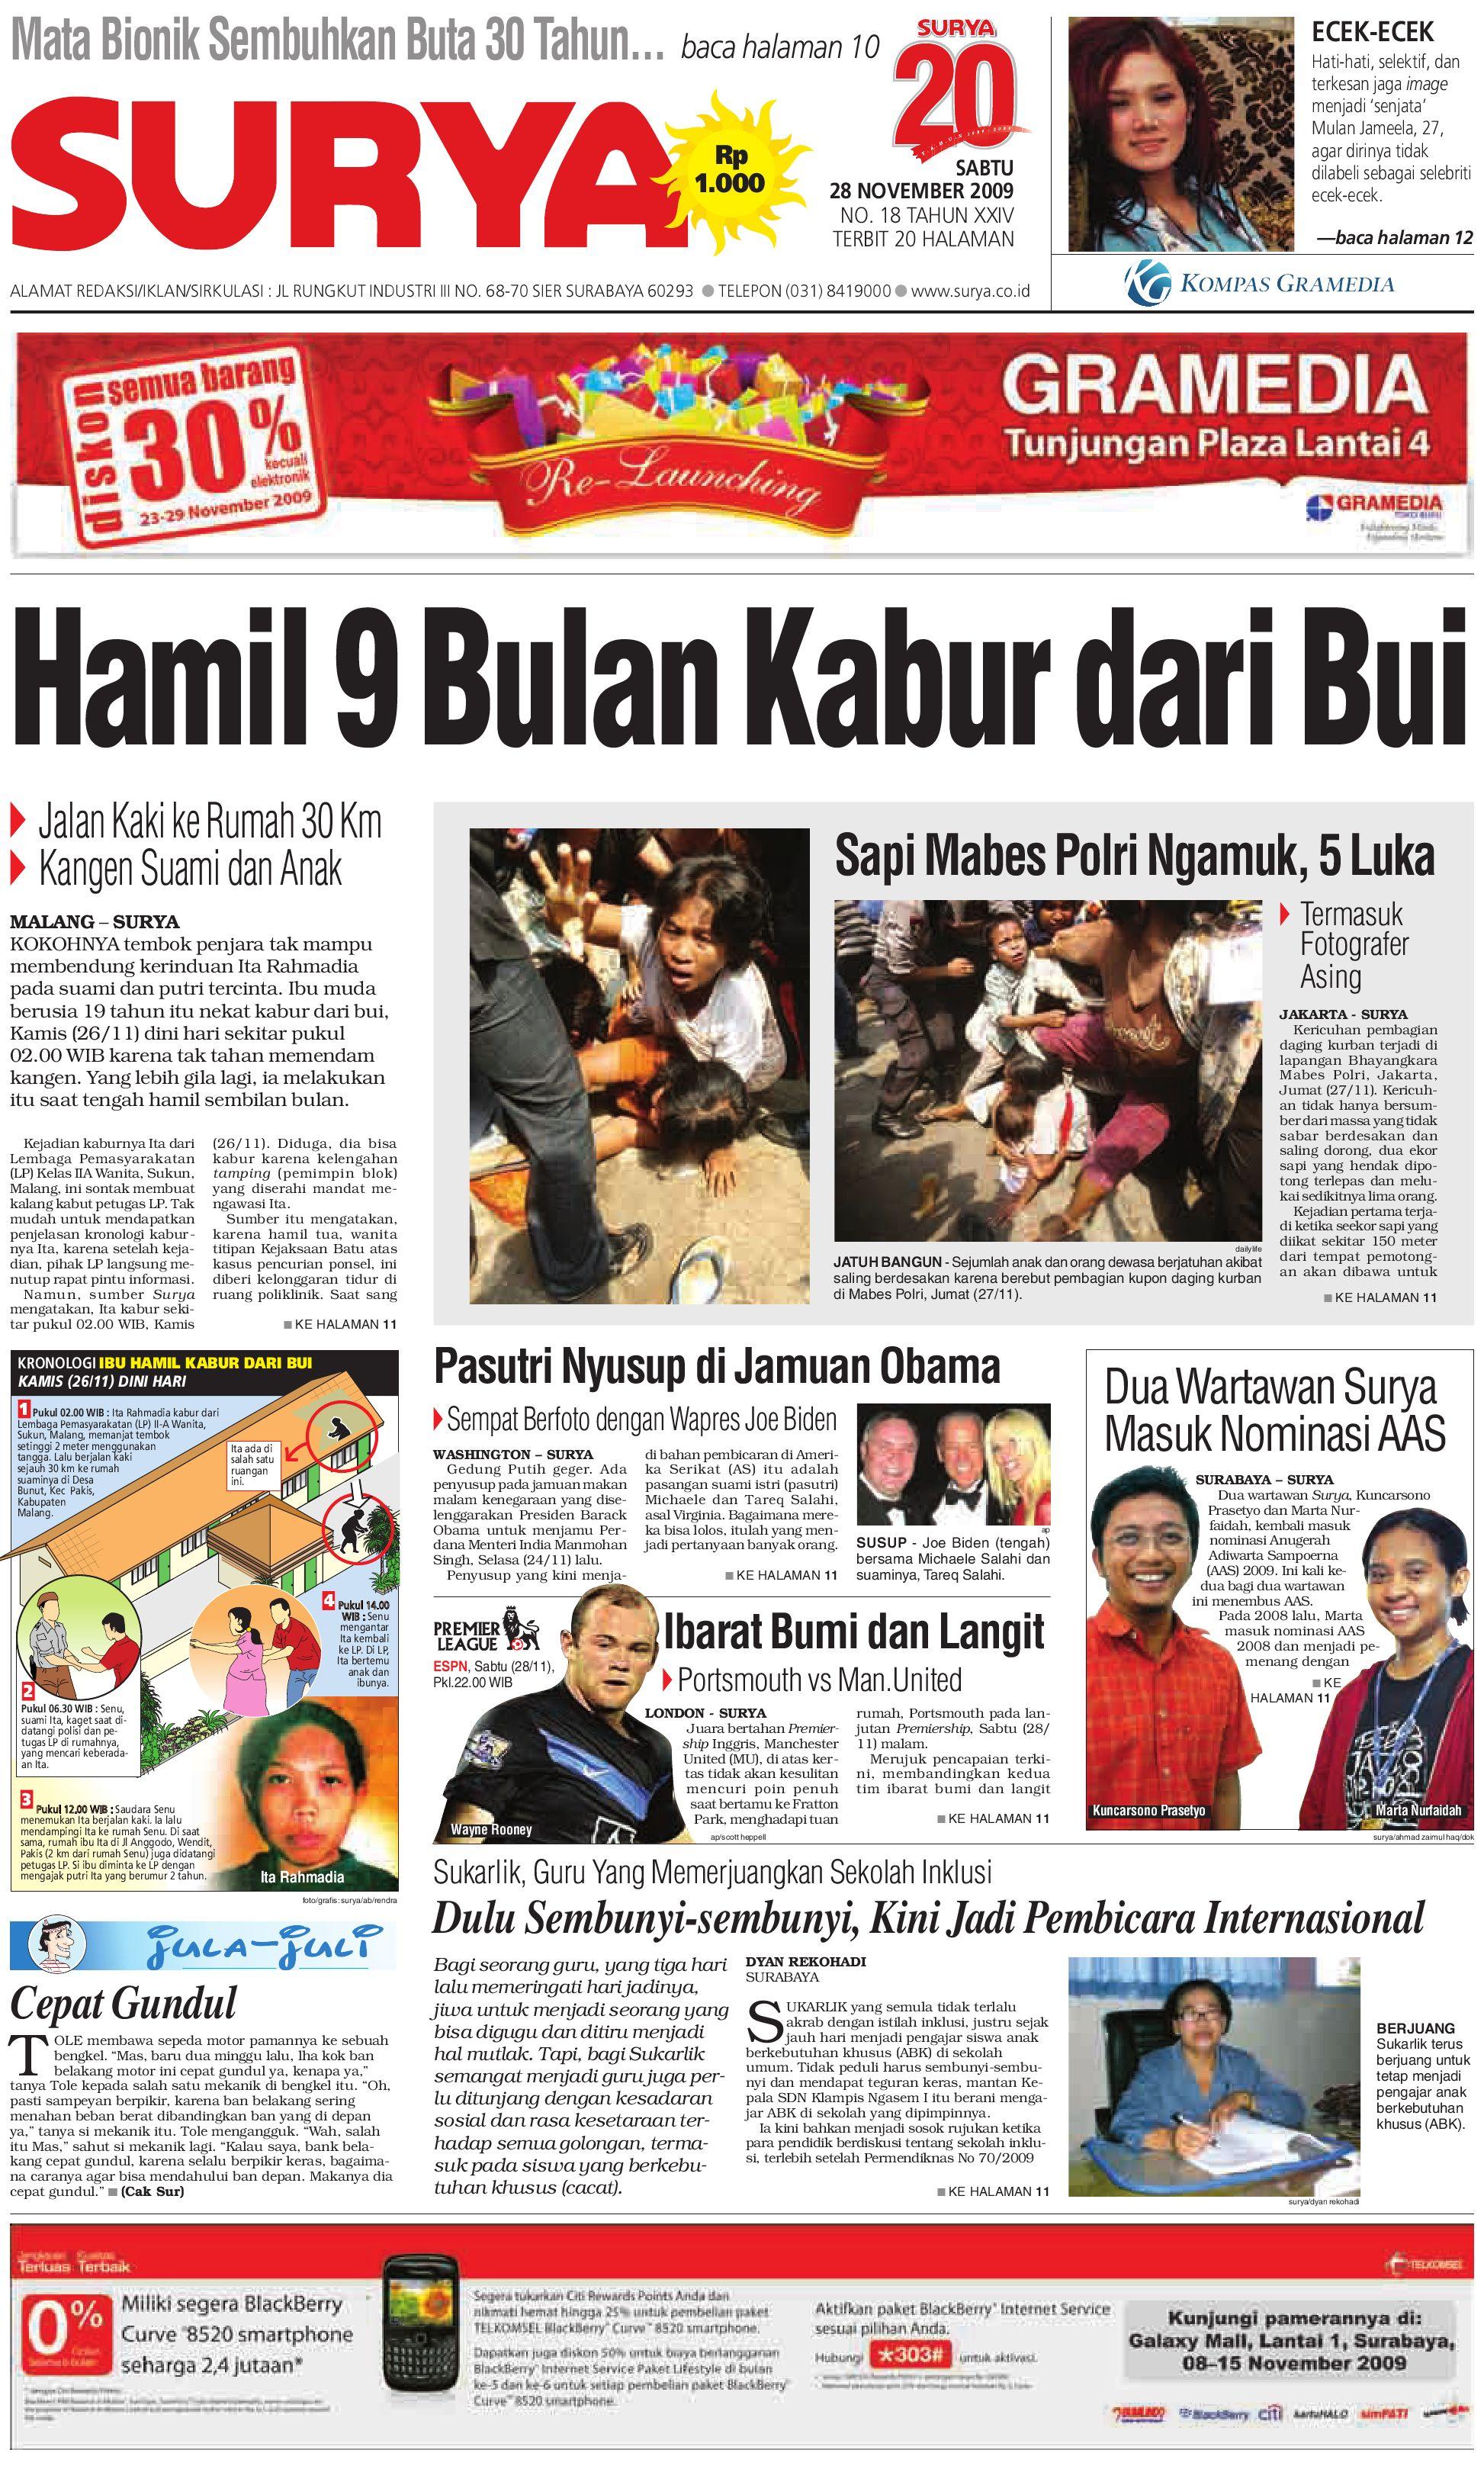 surya edisi cetak 1 juli 2009 by harian surya issuu